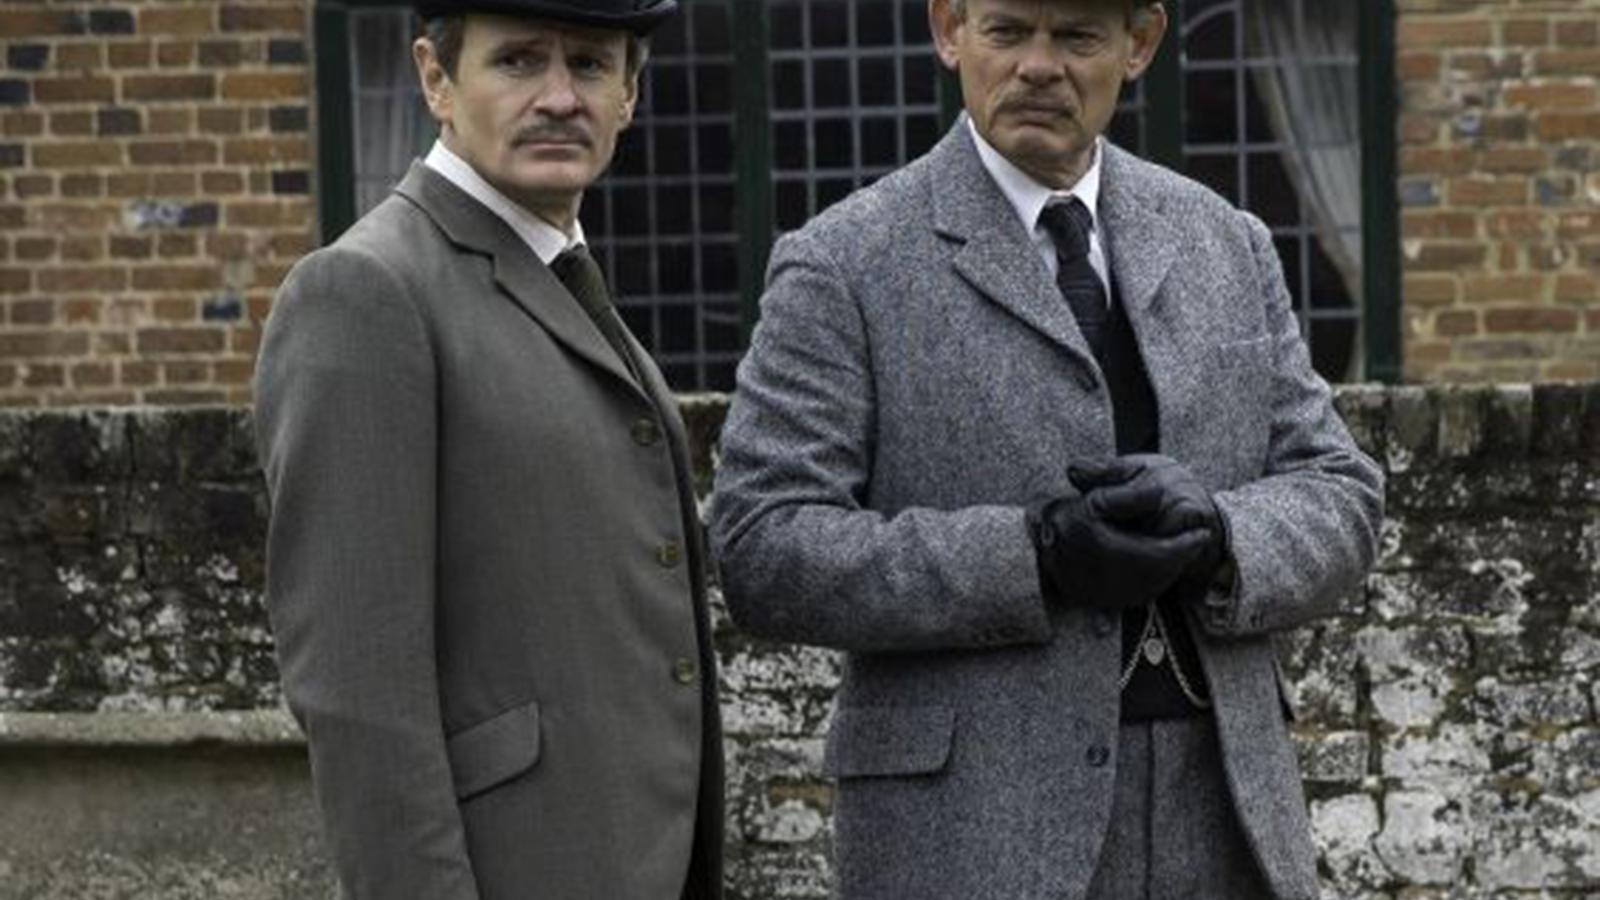 La minisèrie de Sir Arthur Conan Doyle arriba avui a Filmin